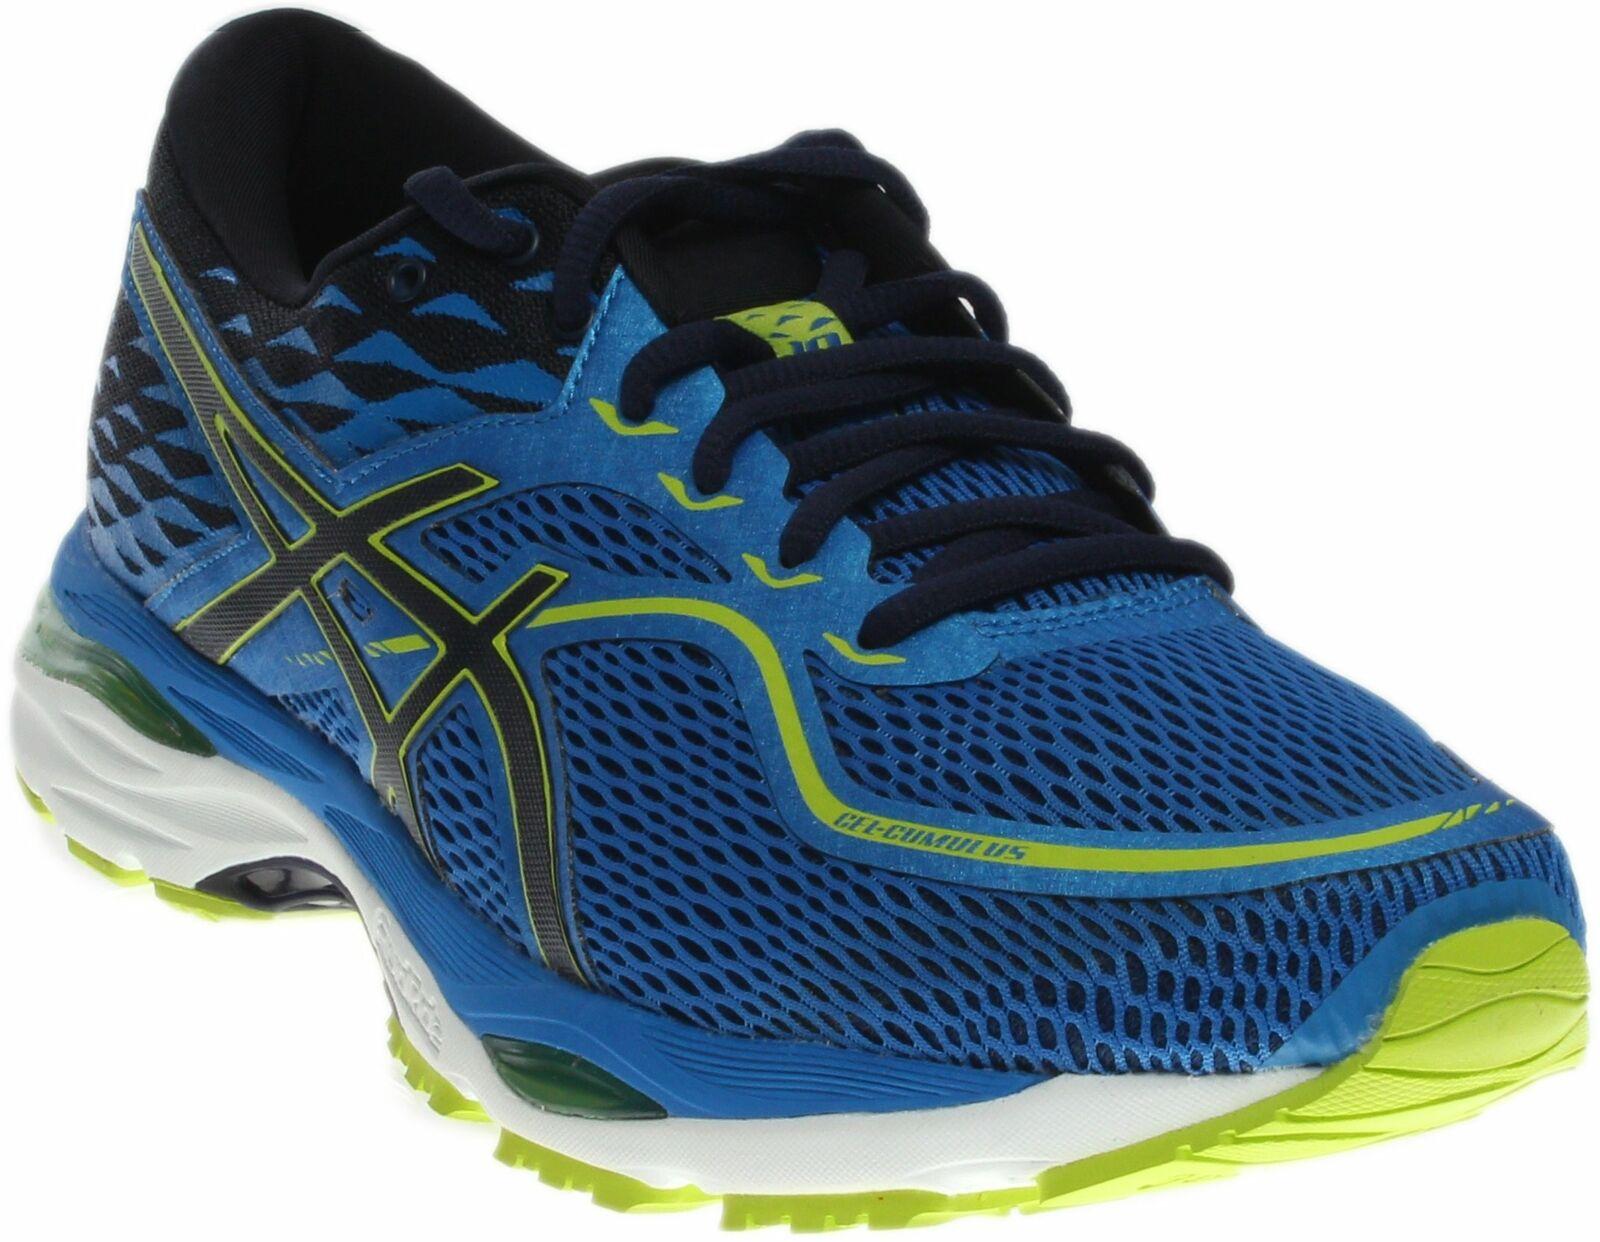 ASICS GEL-Cumulus 19 Running shoes - bluee - Mens